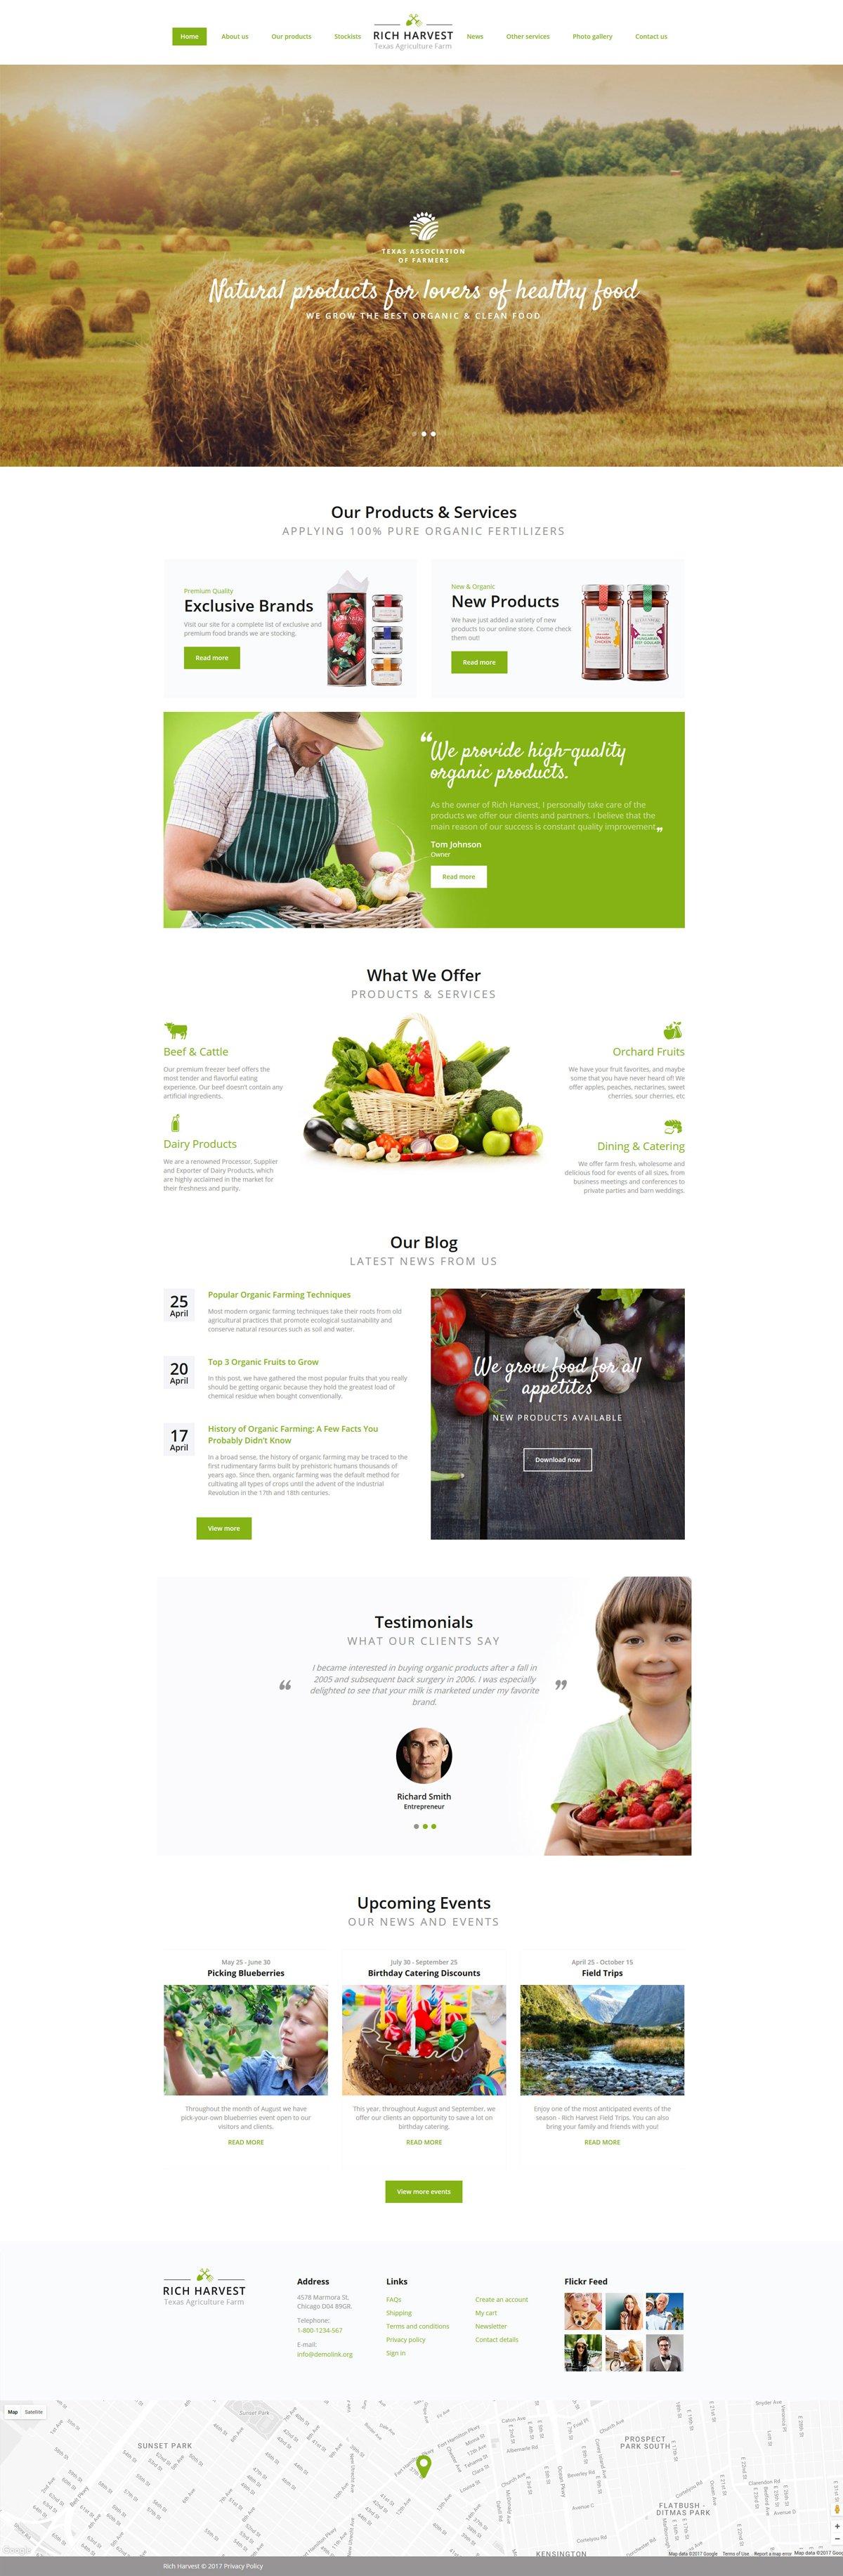 Rich Harvest - Agriculture Farm Responsive Multipage Website Template - screenshot